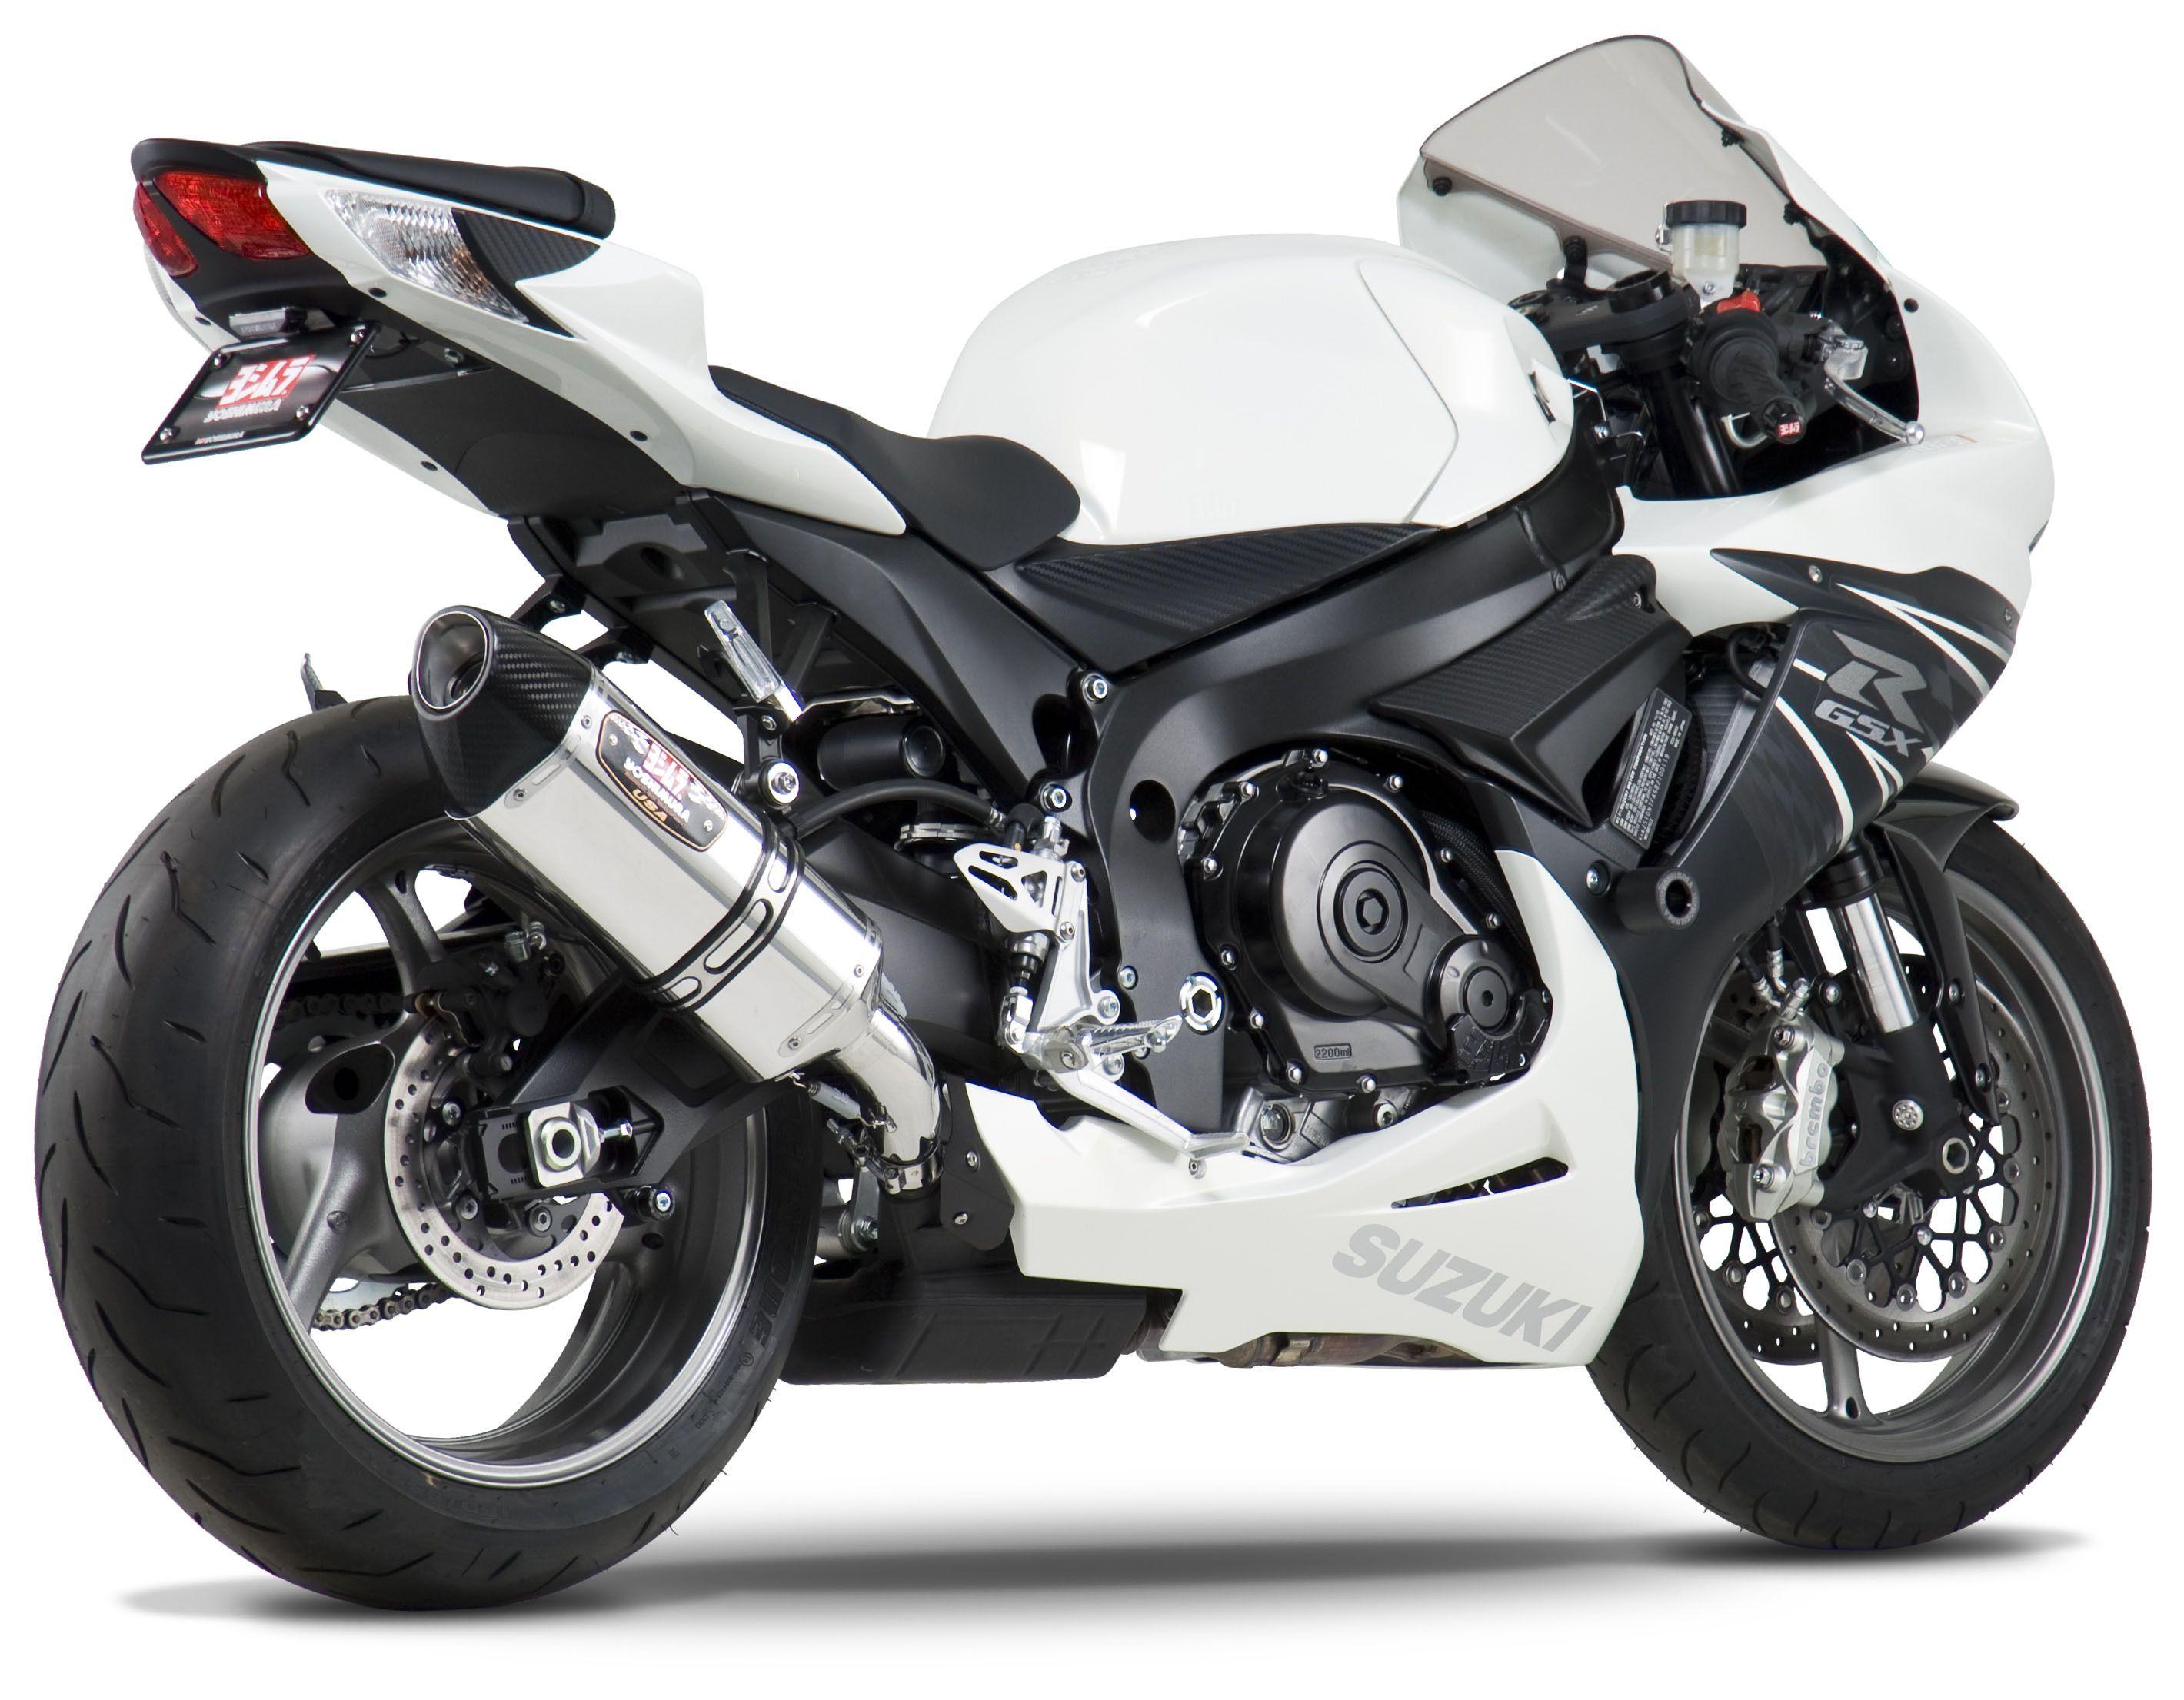 Harga Motor Suzuki Gsxr 600 Impremedia Net